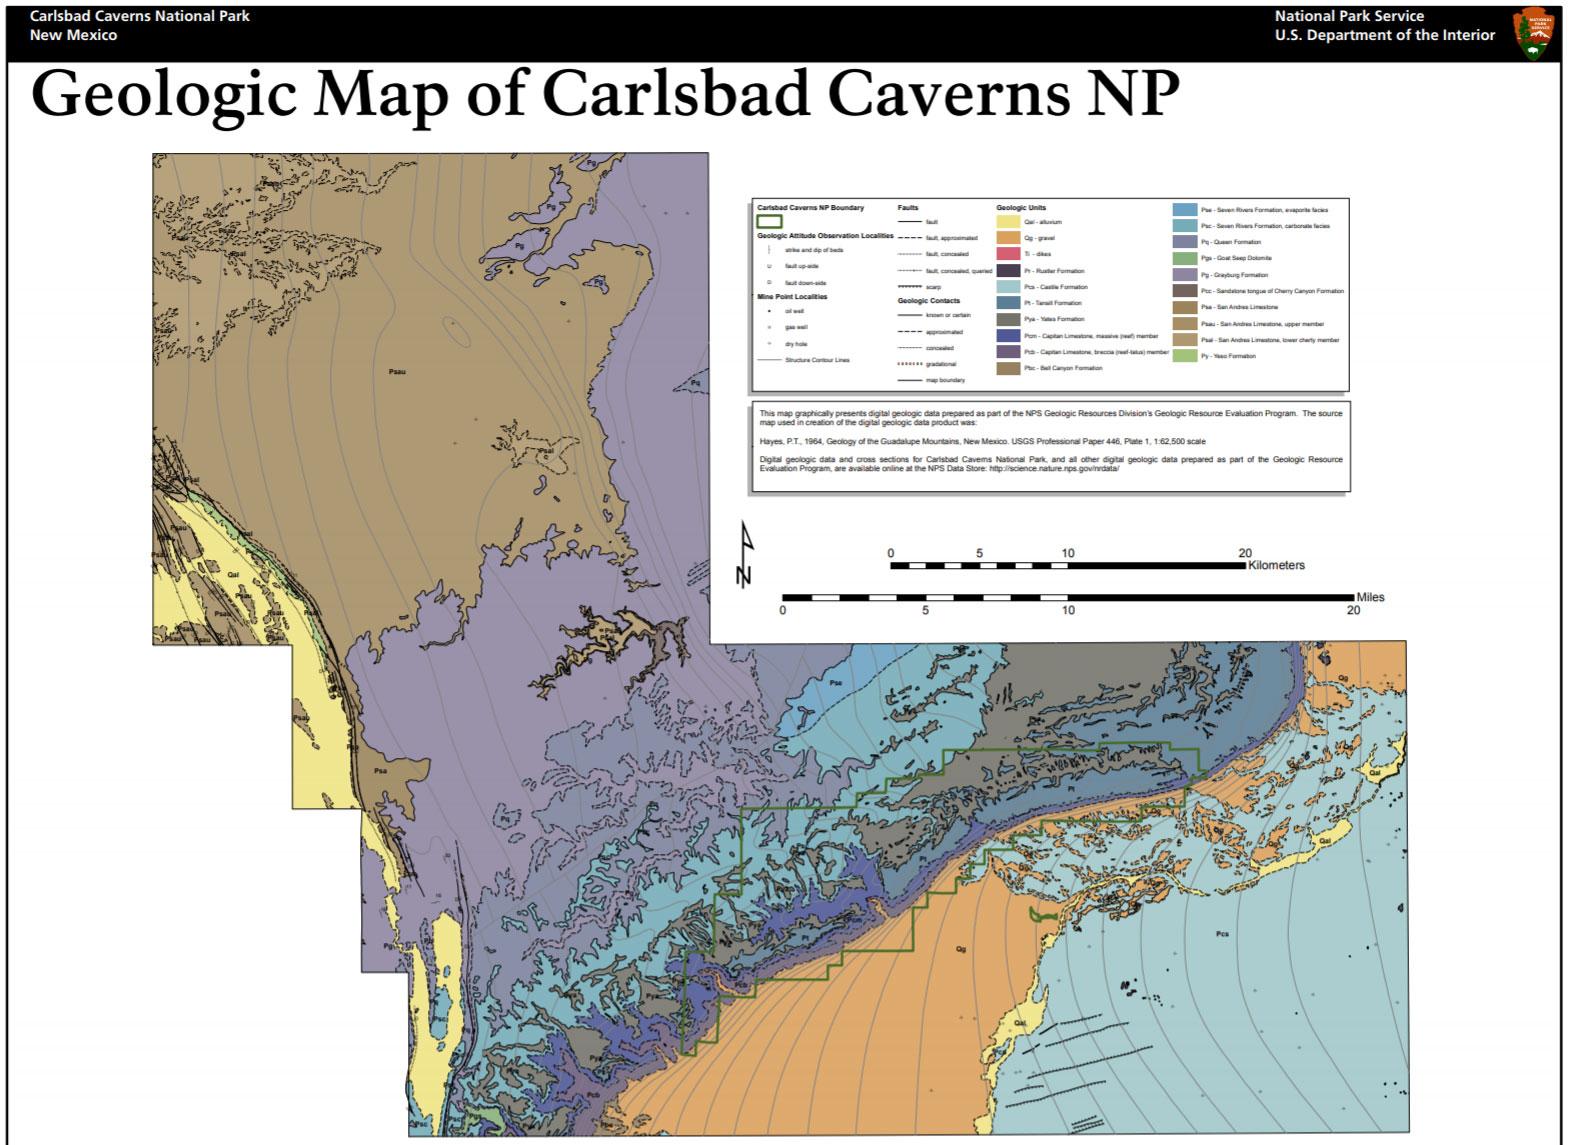 Nps Geodiversity Atlas Carlsbad Caverns National Park New Mexico